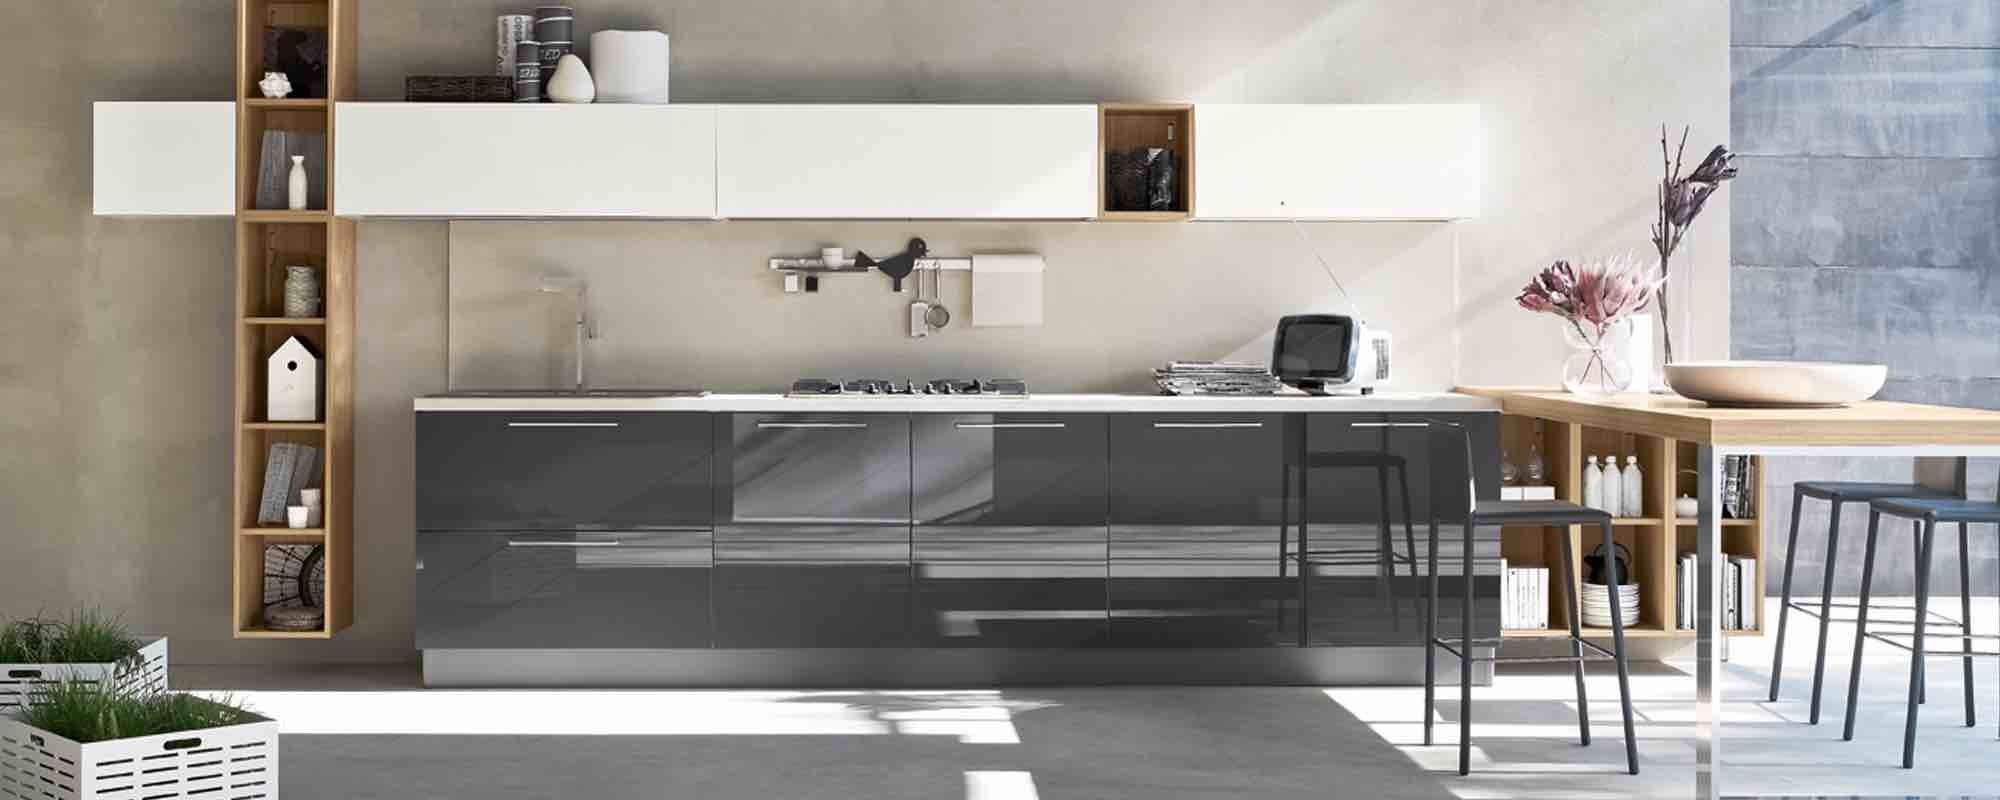 Cucine Moderne Stosa   Modello Cucina Aleve 05